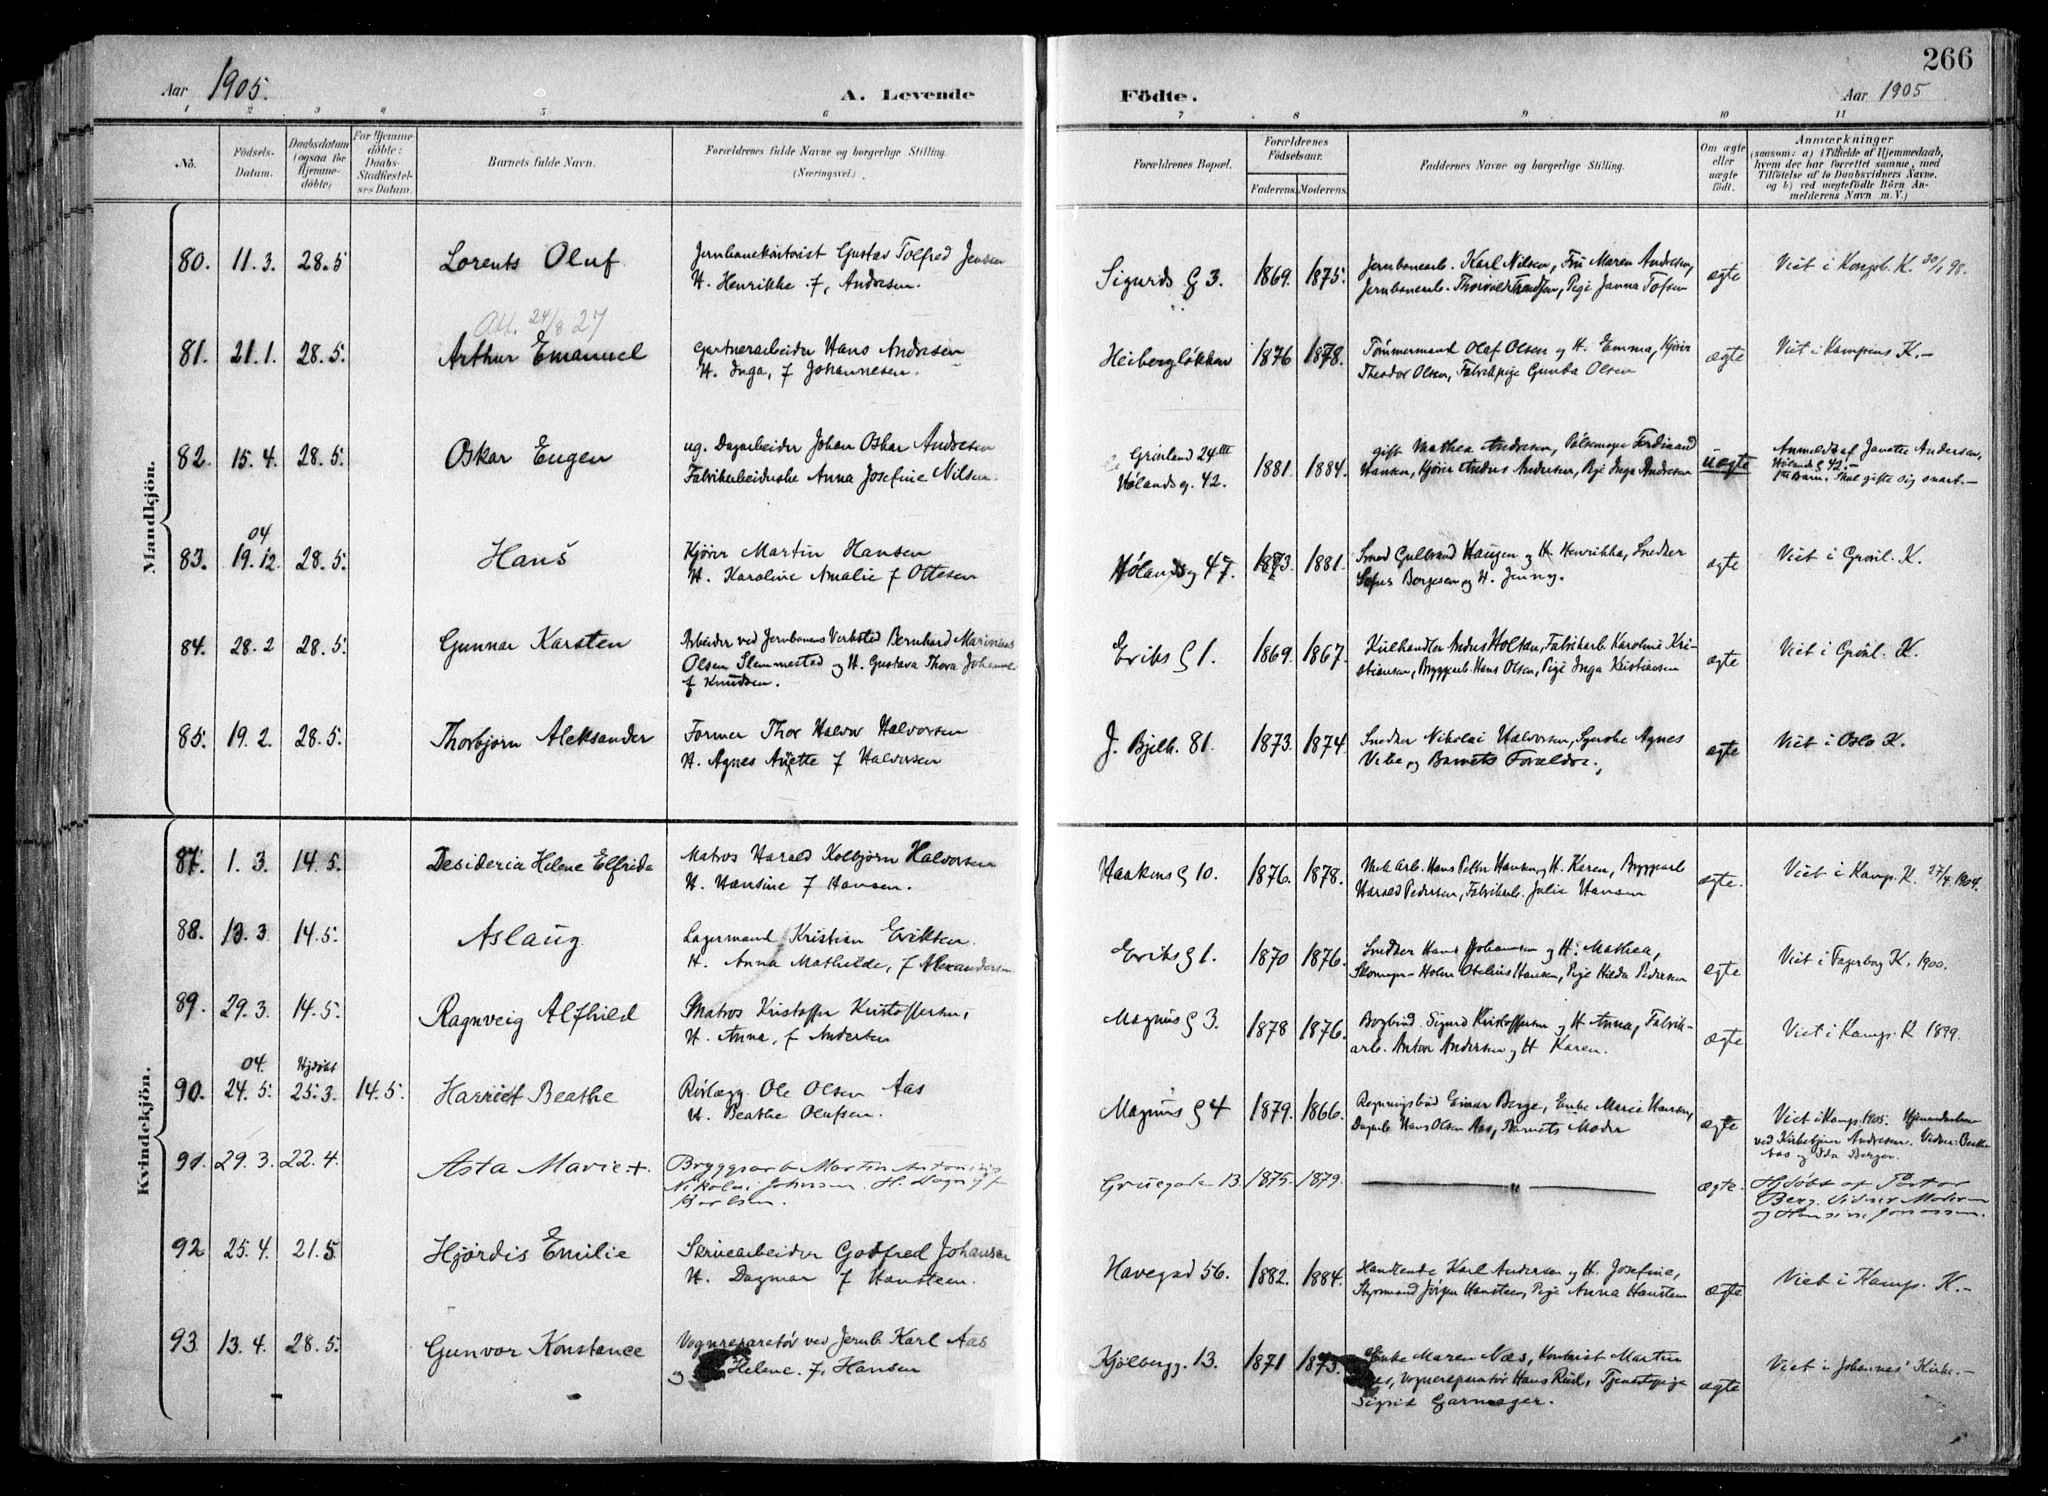 SAO, Kampen prestekontor Kirkebøker, F/Fa/L0007: Ministerialbok nr. I 7, 1897-1905, s. 266